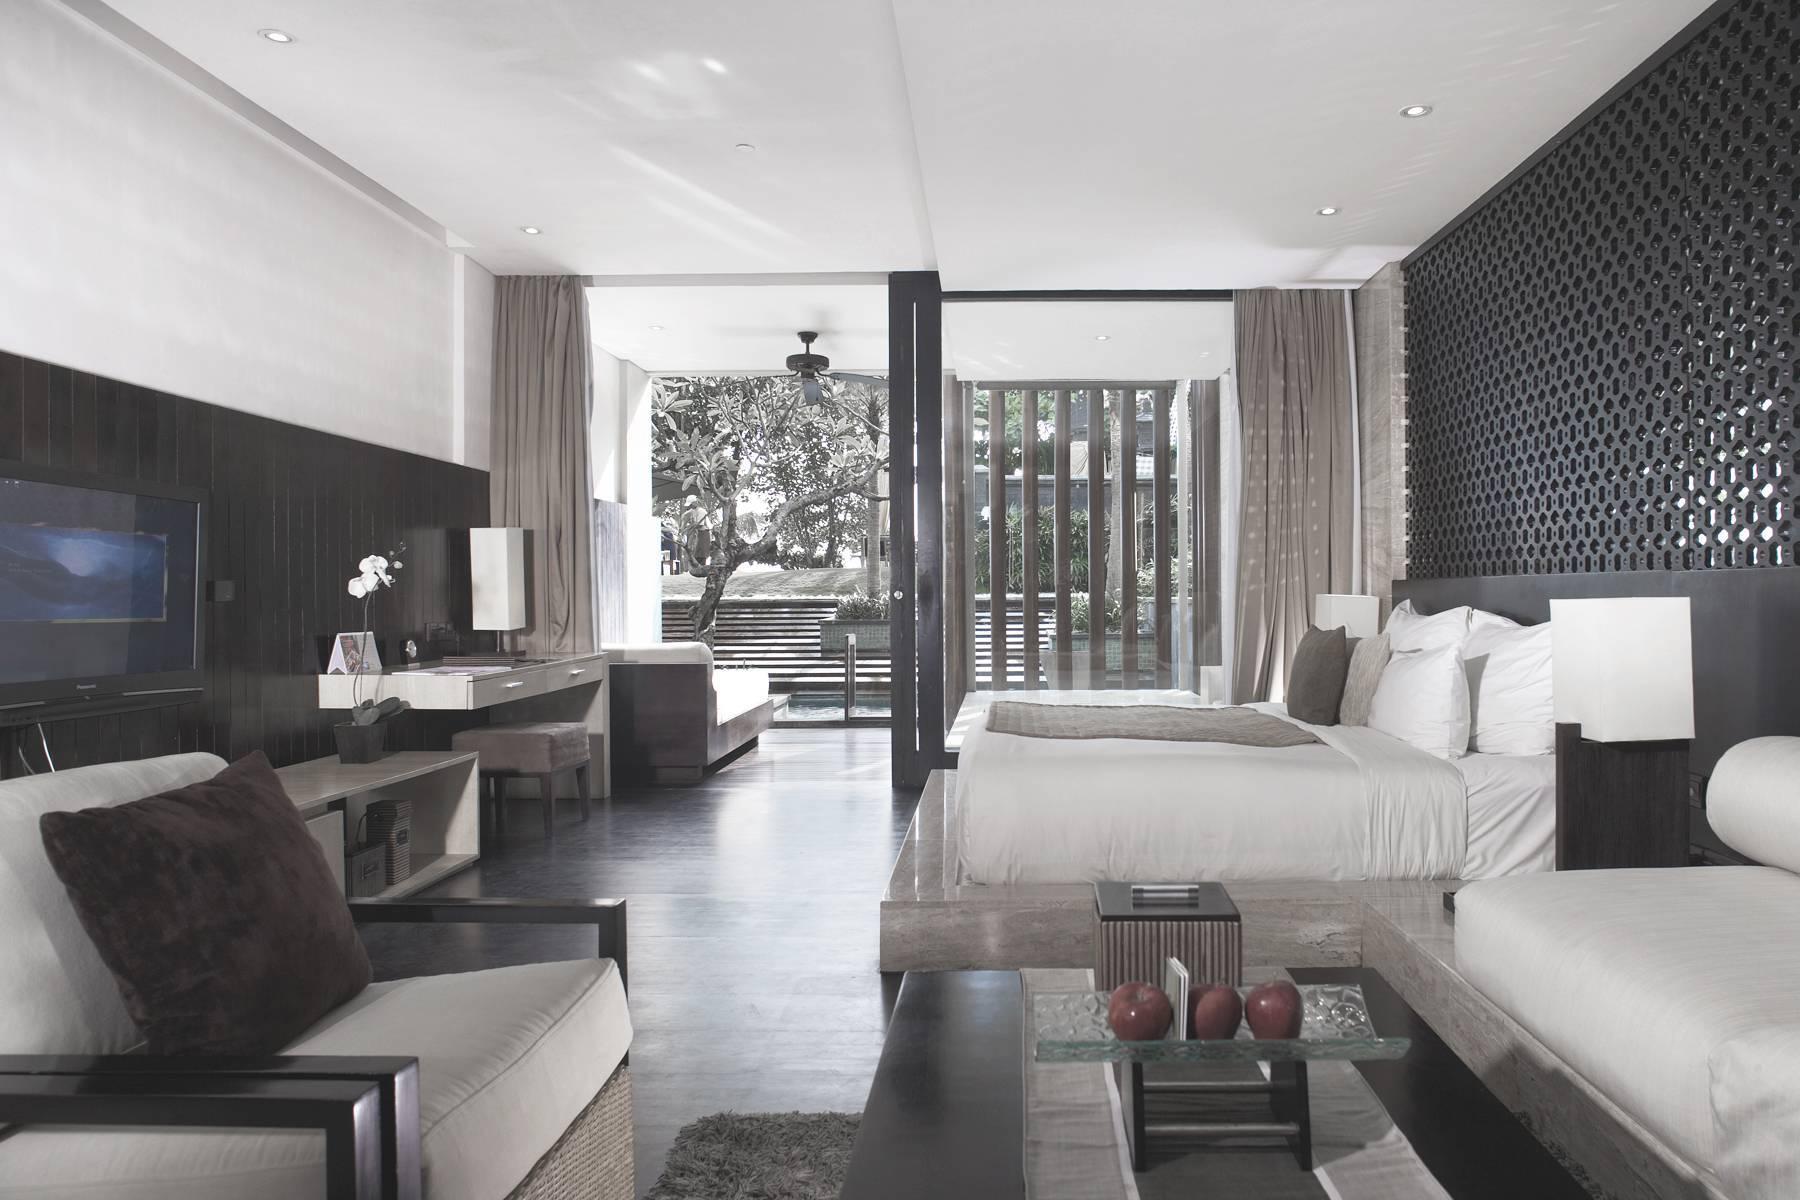 Antony Liu + Ferry Ridwan / Studio Tonton Anantara Seminyak Bali Resort Seminyak, Bali, Indonesia Seminyak, Bali, Indonesia Bedroom Modern  8027